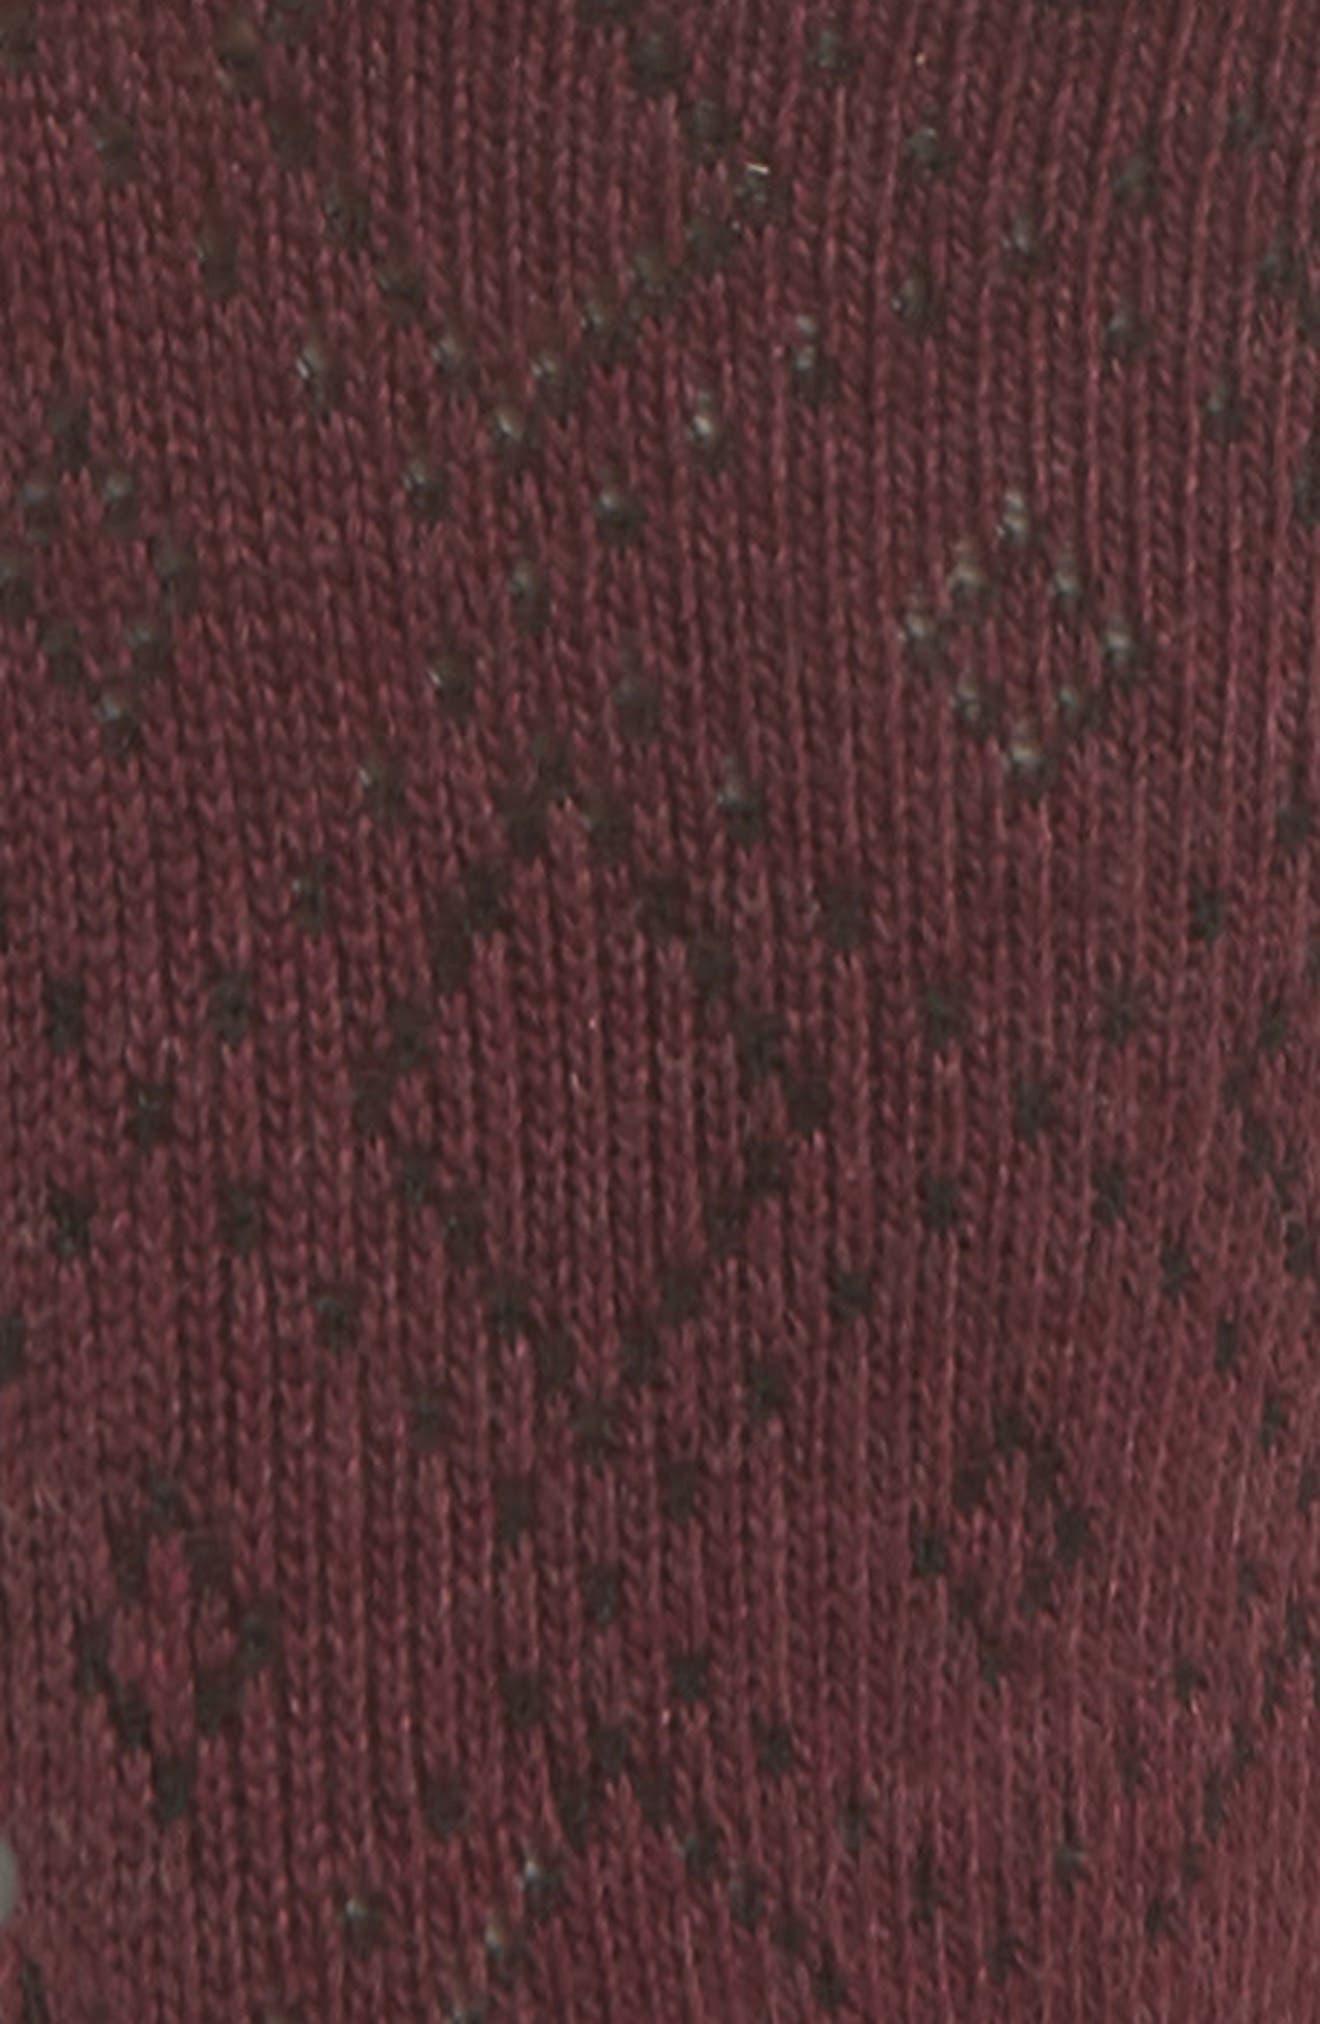 Low Rise Half-Toe Gripper Socks,                             Alternate thumbnail 3, color,                             VIXEN